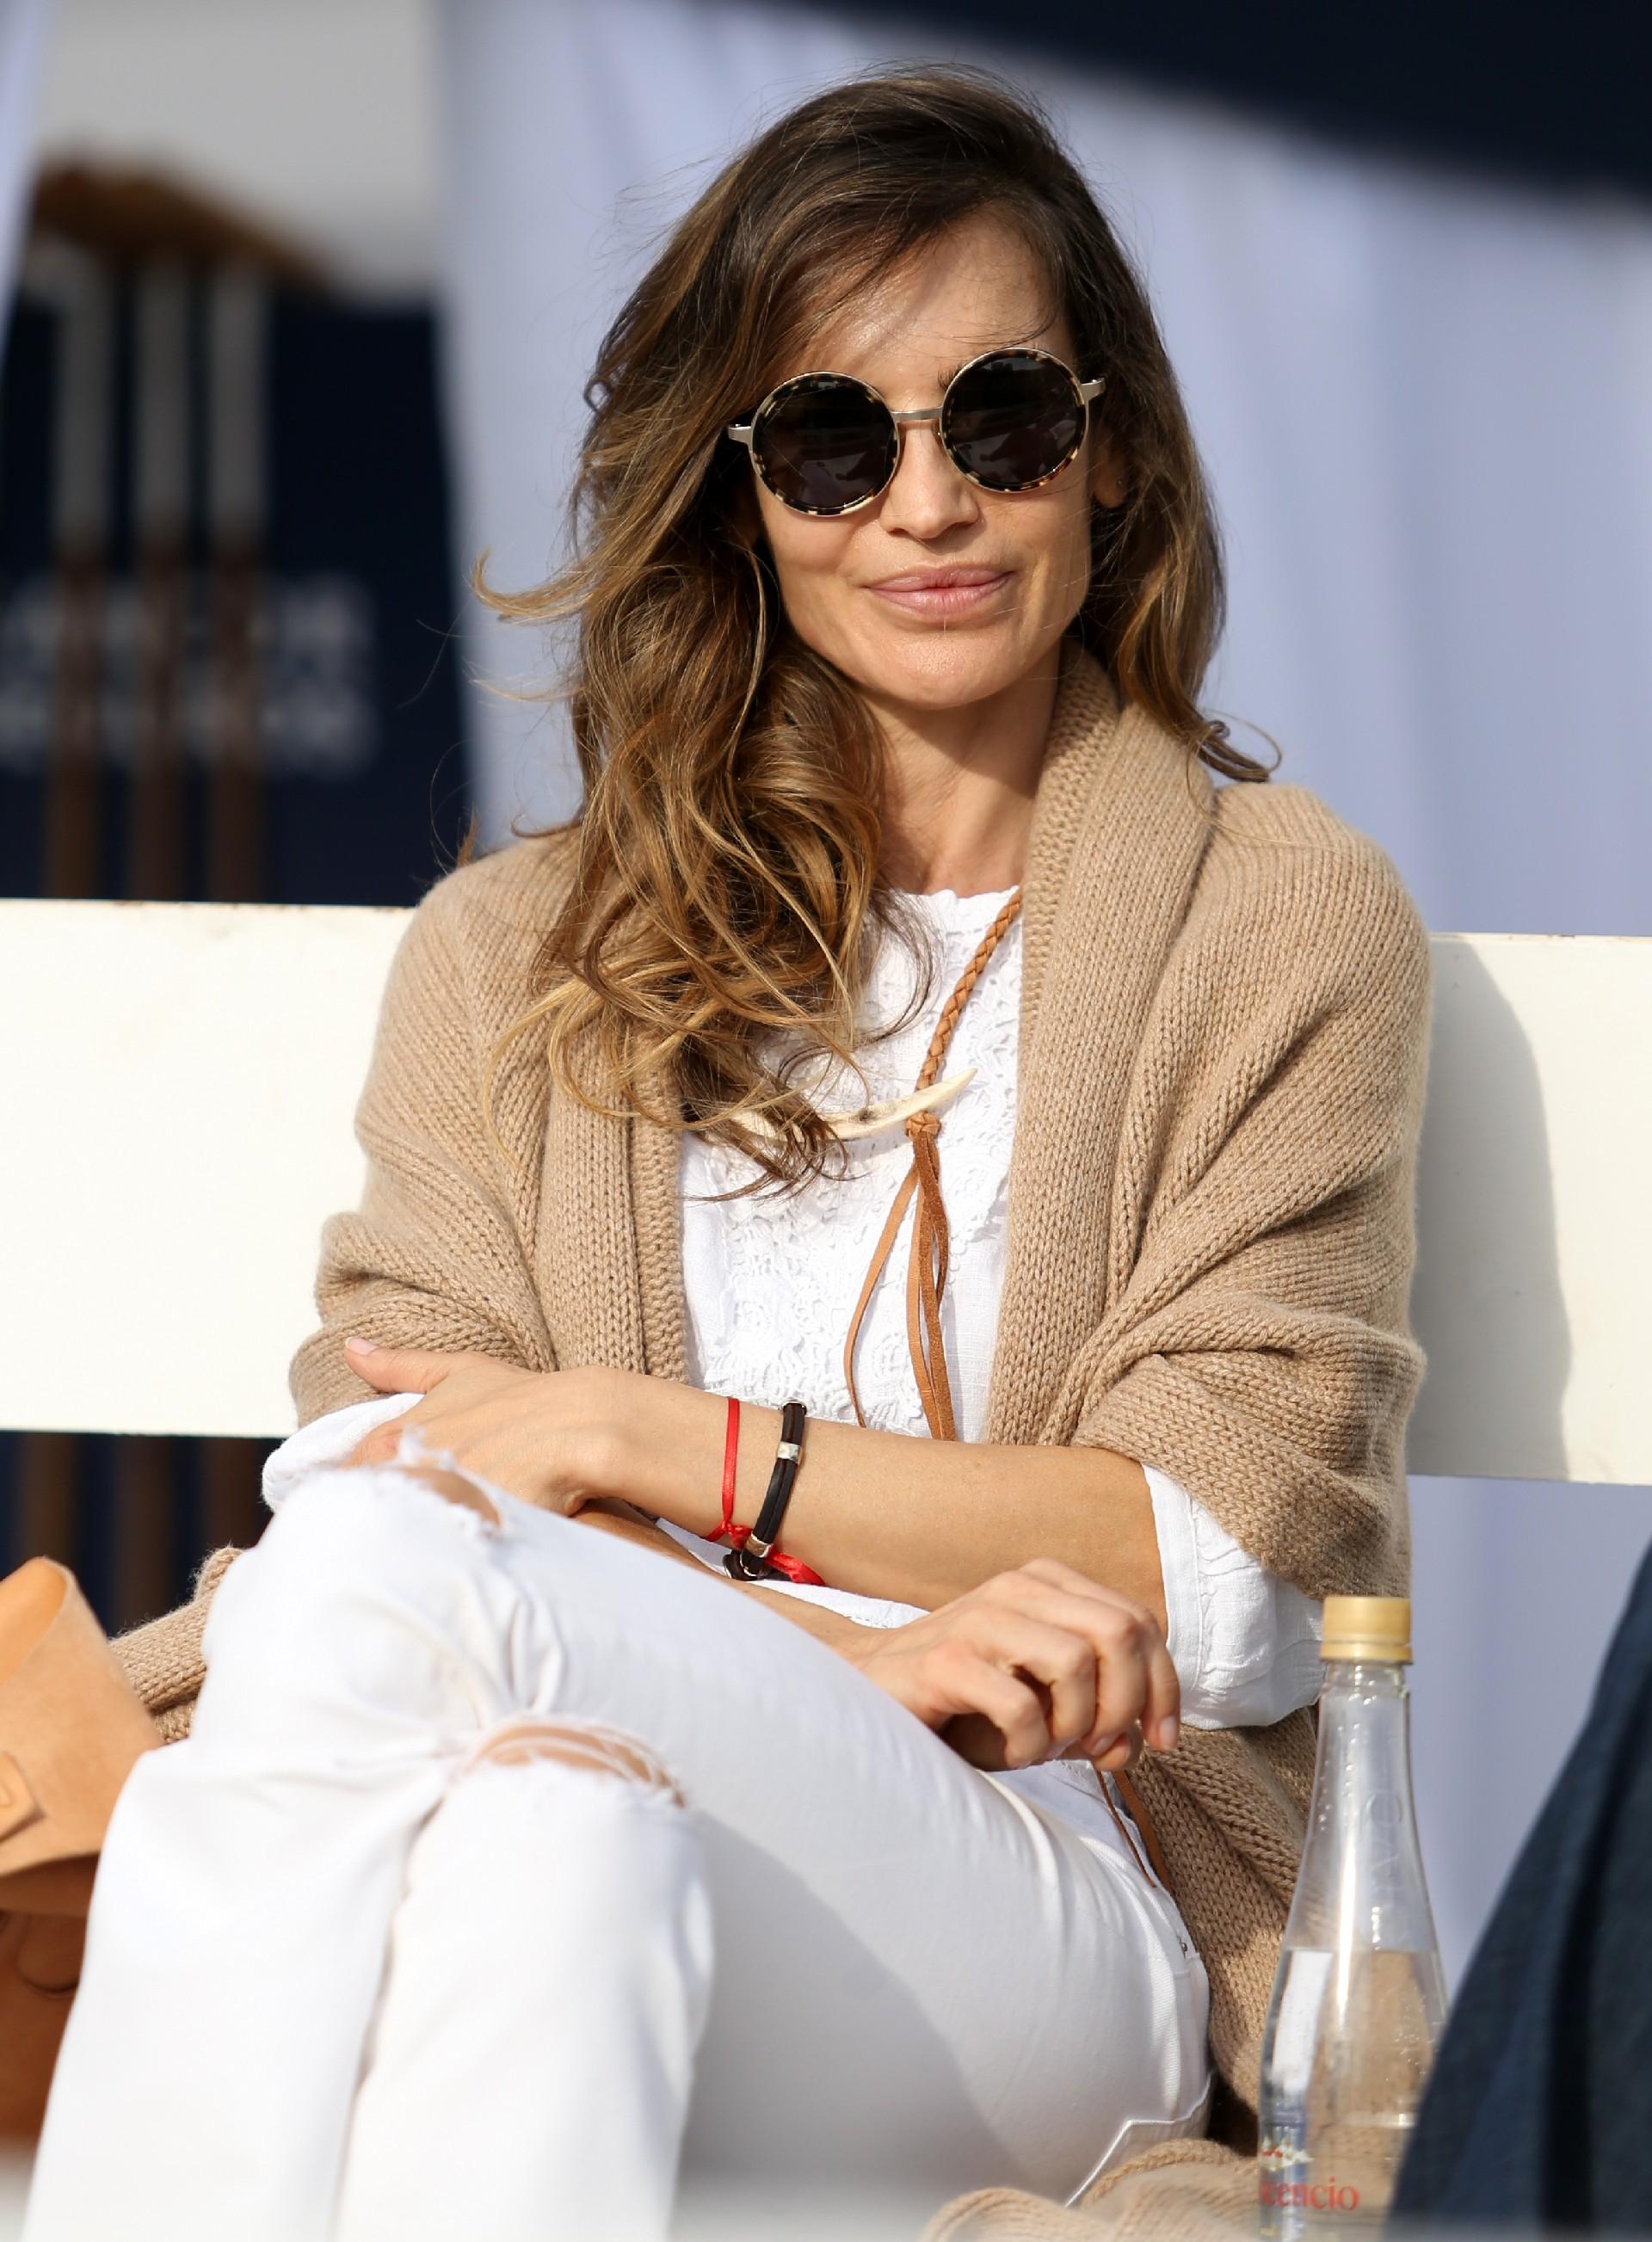 María Vázquez siguió con detalle cada momento de la final